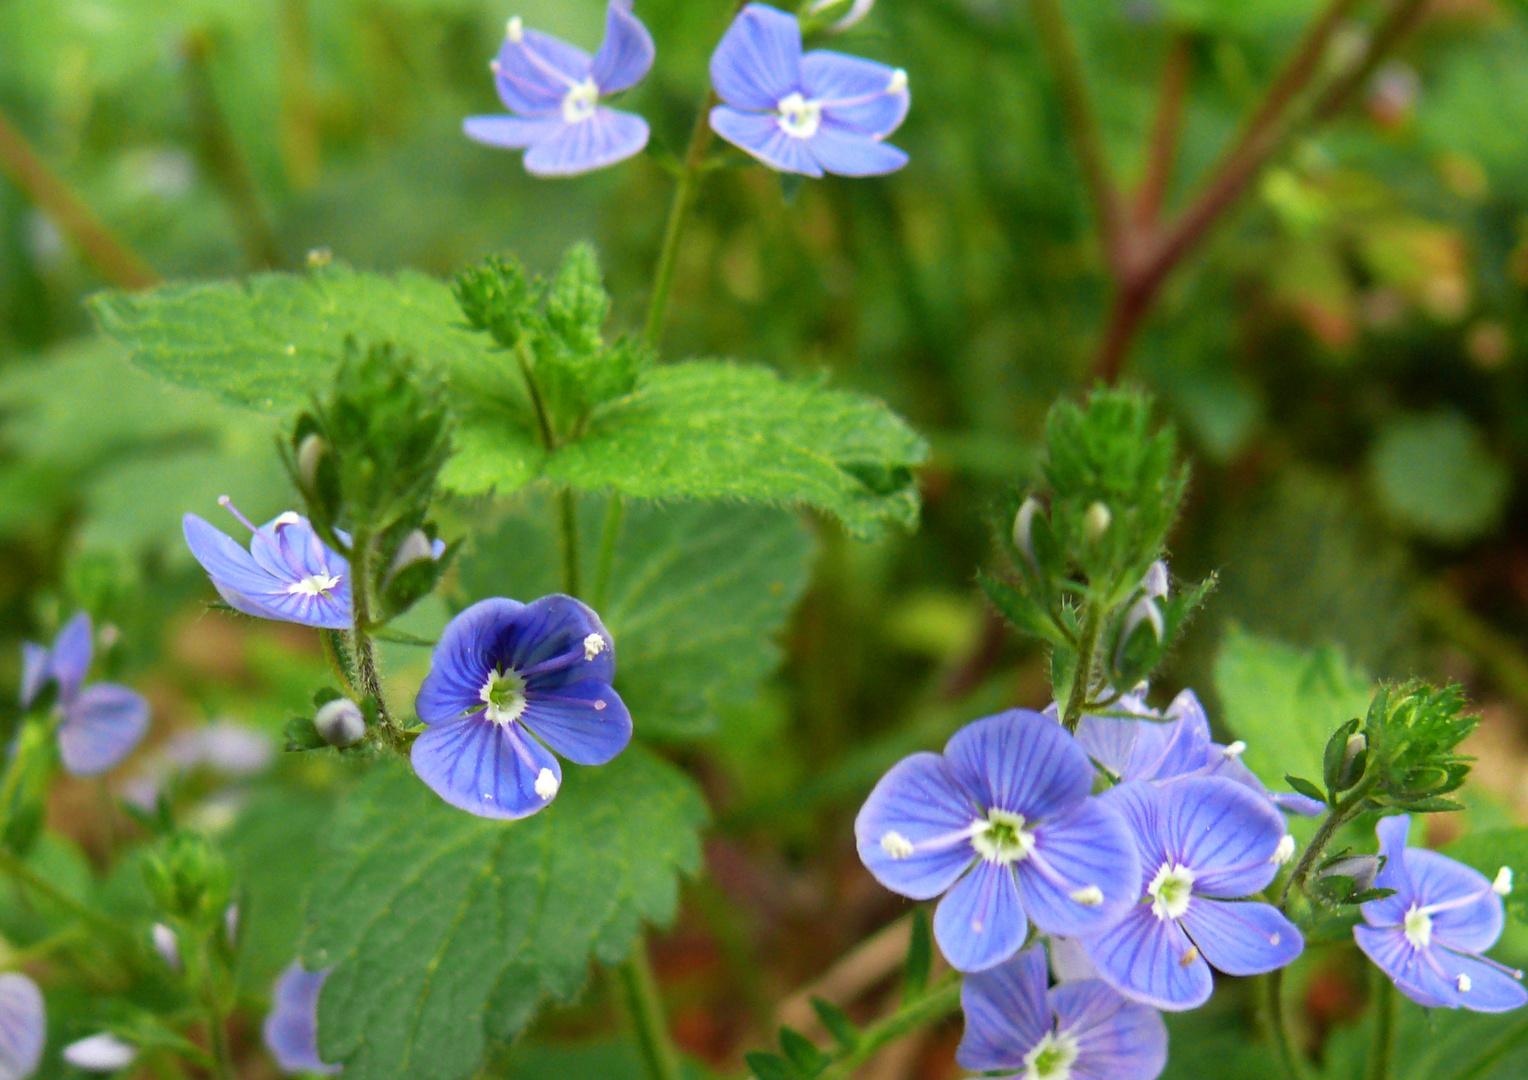 Zarte Blüten am Waldrand 3